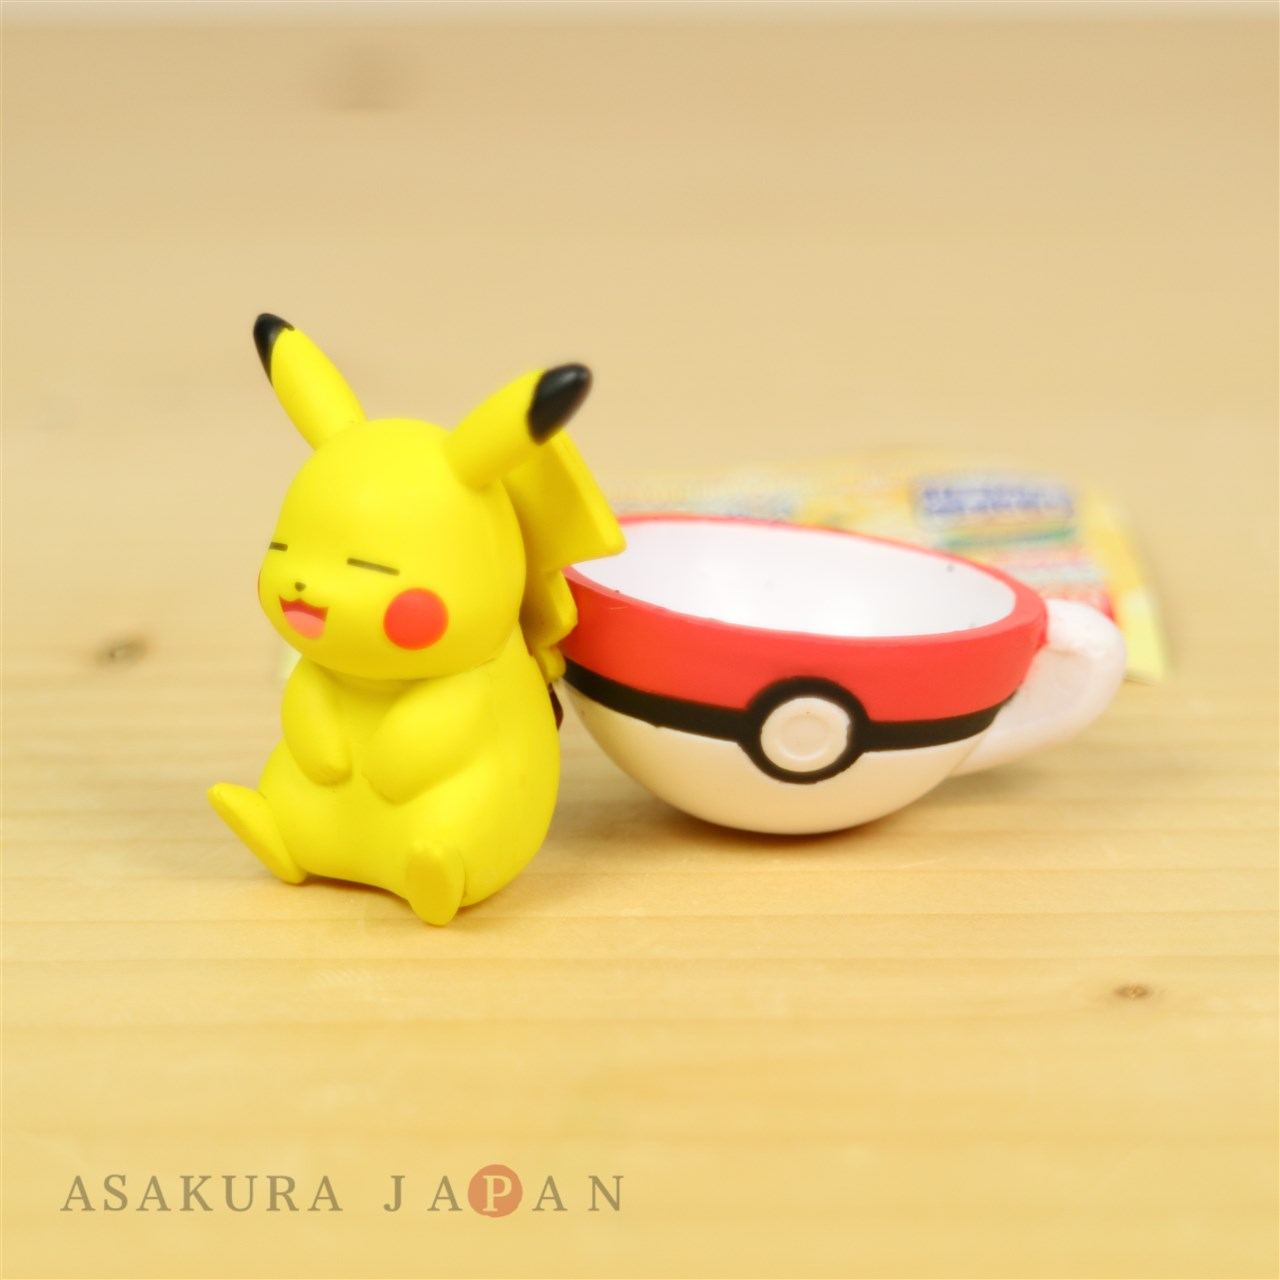 Pokemon Teacup Time Mascot Volume 2 Mini Figure Collection 0483095 Gashapon Tea Cup 4 24573 Gacha Vol4 Pikachu Bandai 18072107